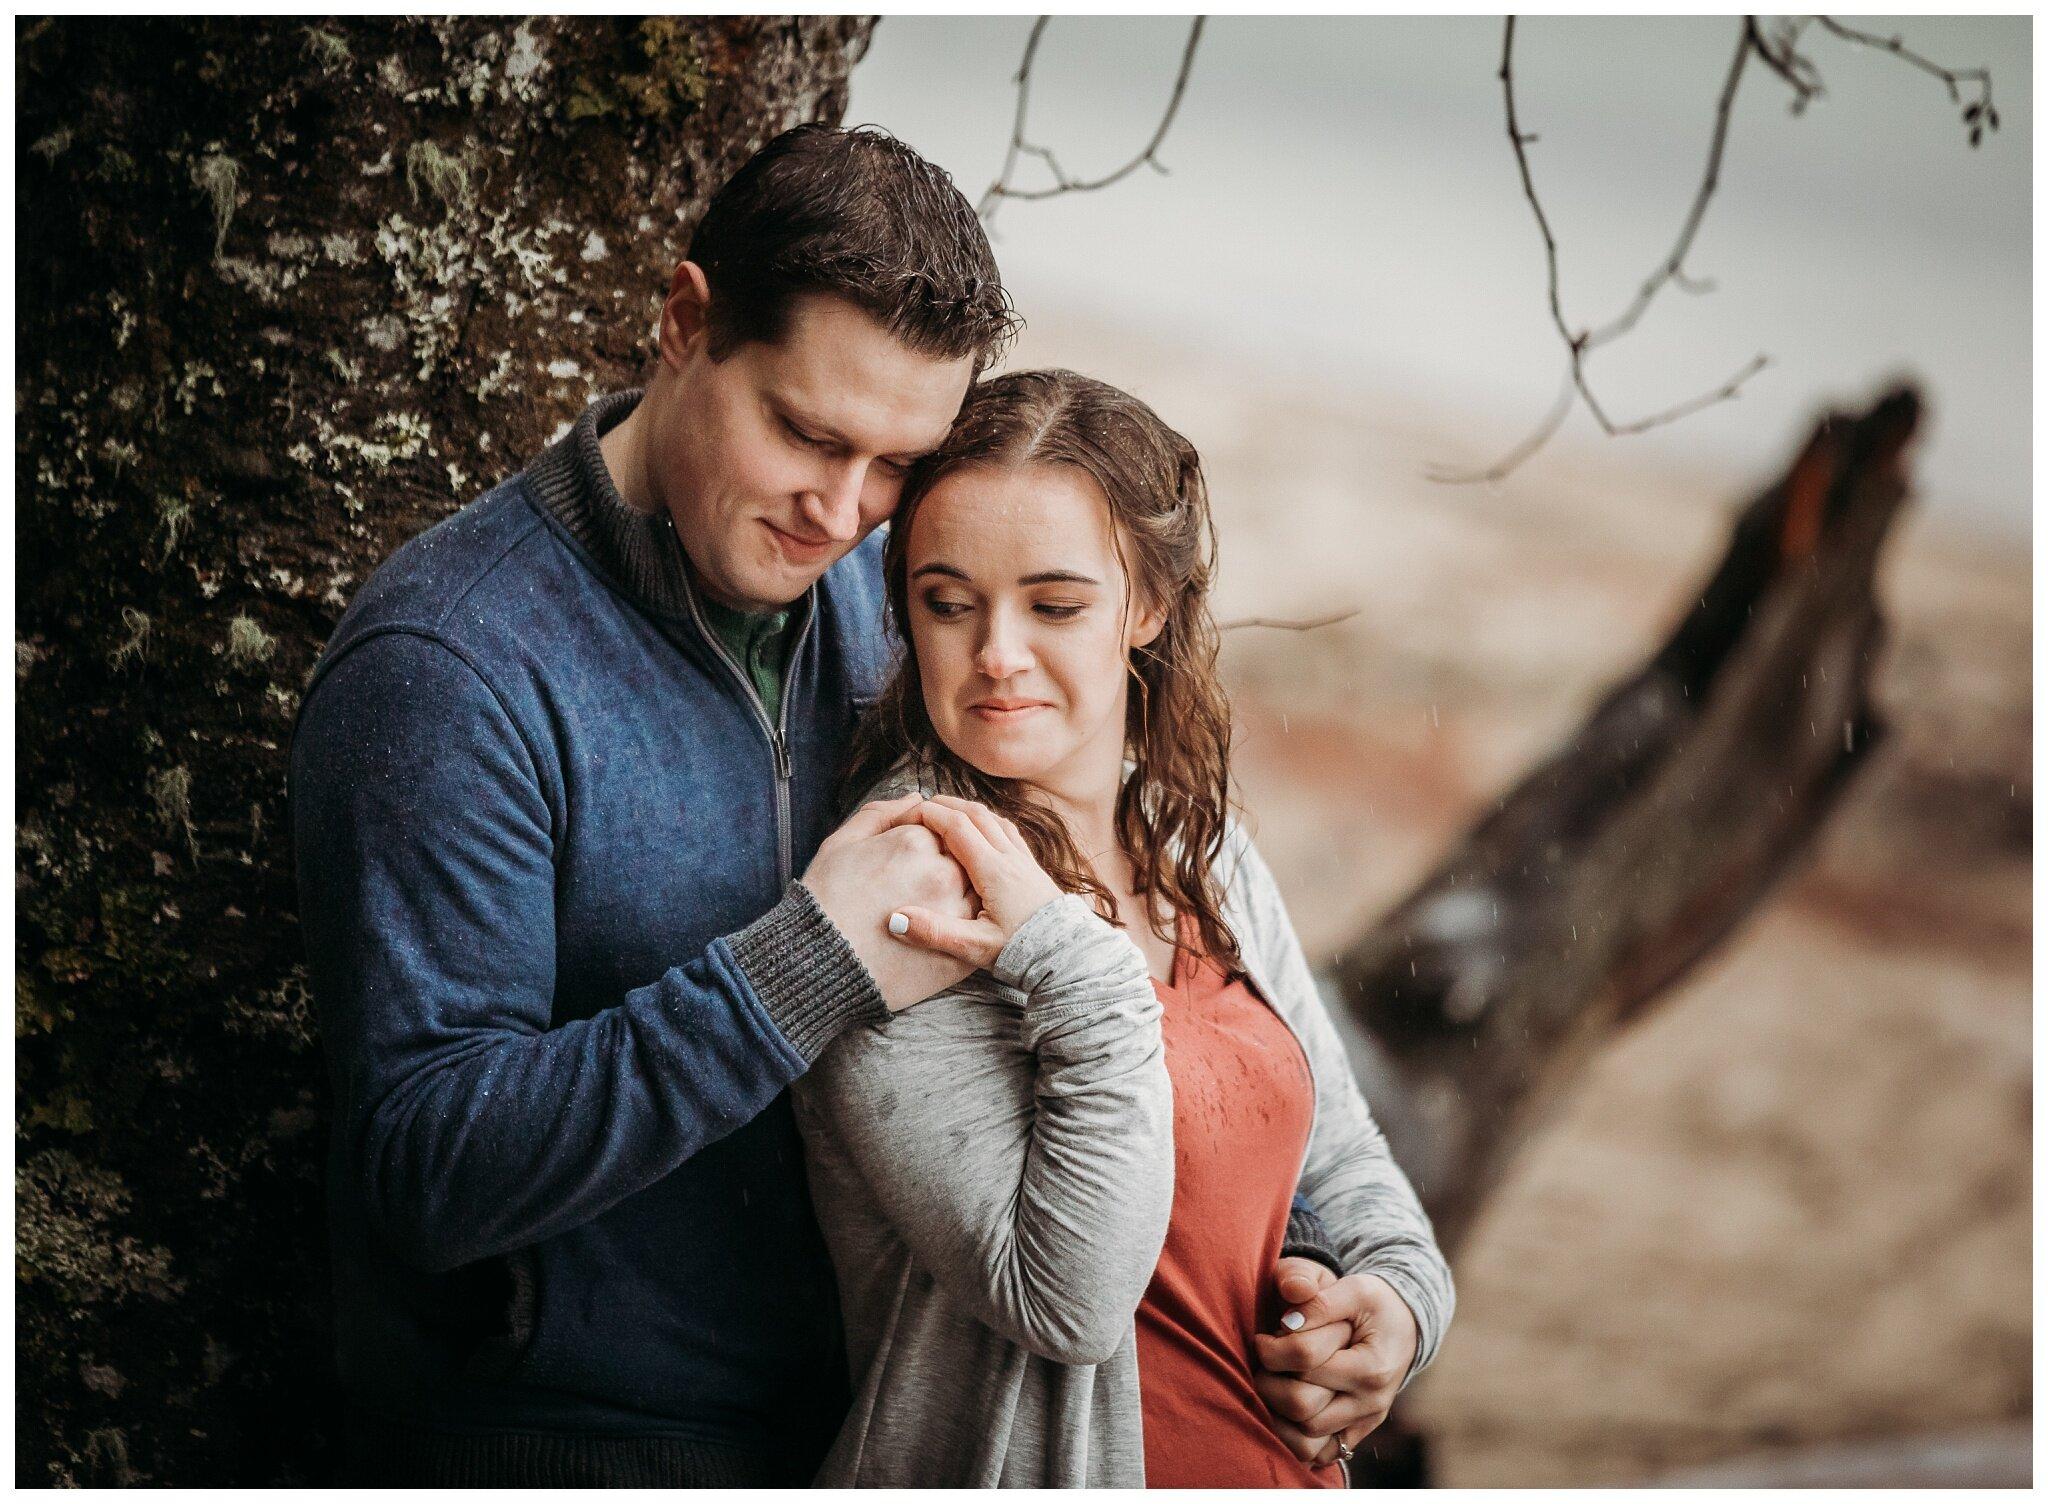 Chilliwack Lake Rainy Winter Engagement Photography Session Couples Photographer_0009.jpg